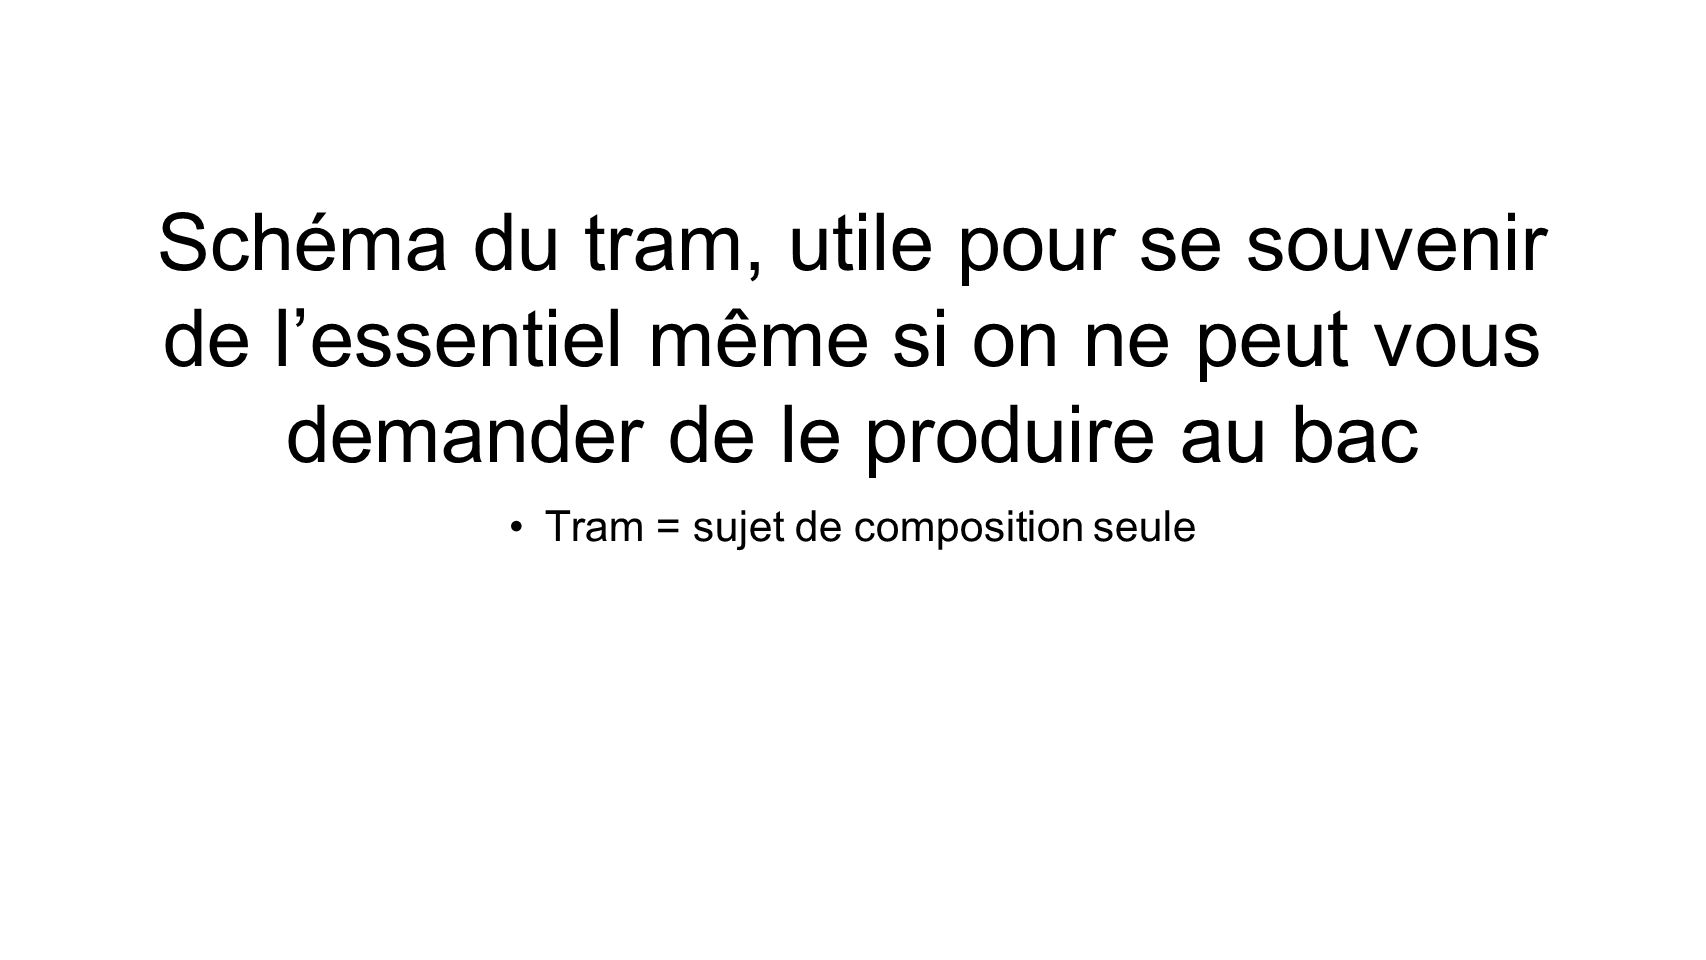 vI M P R I M 20 ORLEANS Olivet Saint-Jean-de-Braye Fleury-les-Aubrais I SDV SJLB Saran Chapelle- St-Mesmin S-H- S-M B-S-B.